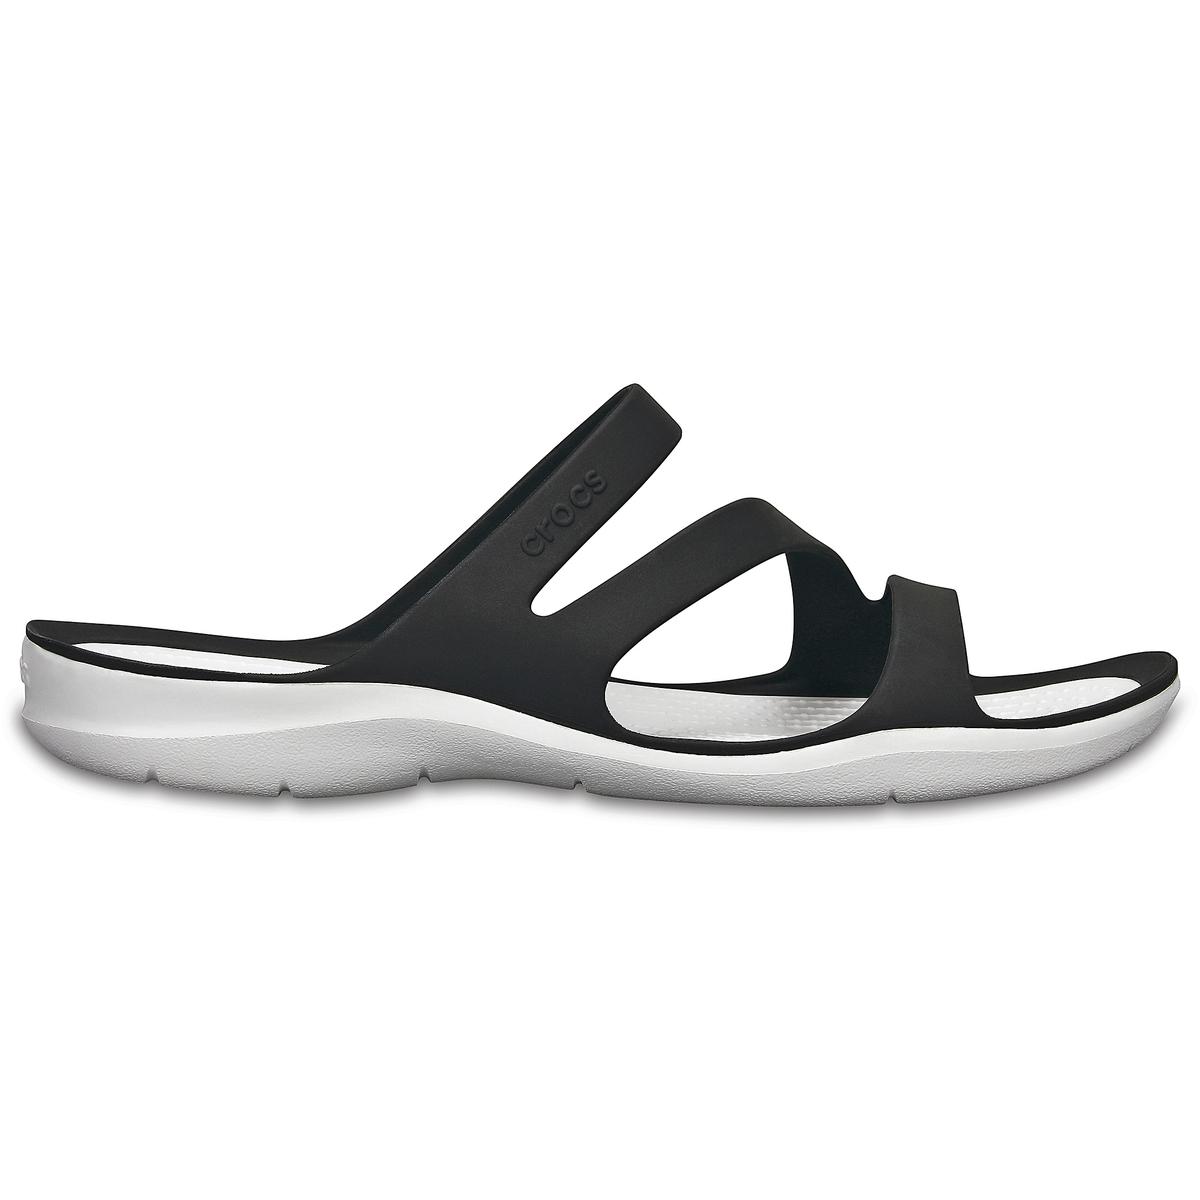 Туфли без задника Swiftwater Sandal WВерх : термопластик   Подкладка : без подкладки   Стелька : термопластик   Подошва : полимер Croslite   Застежка : без застежки<br><br>Цвет: серый